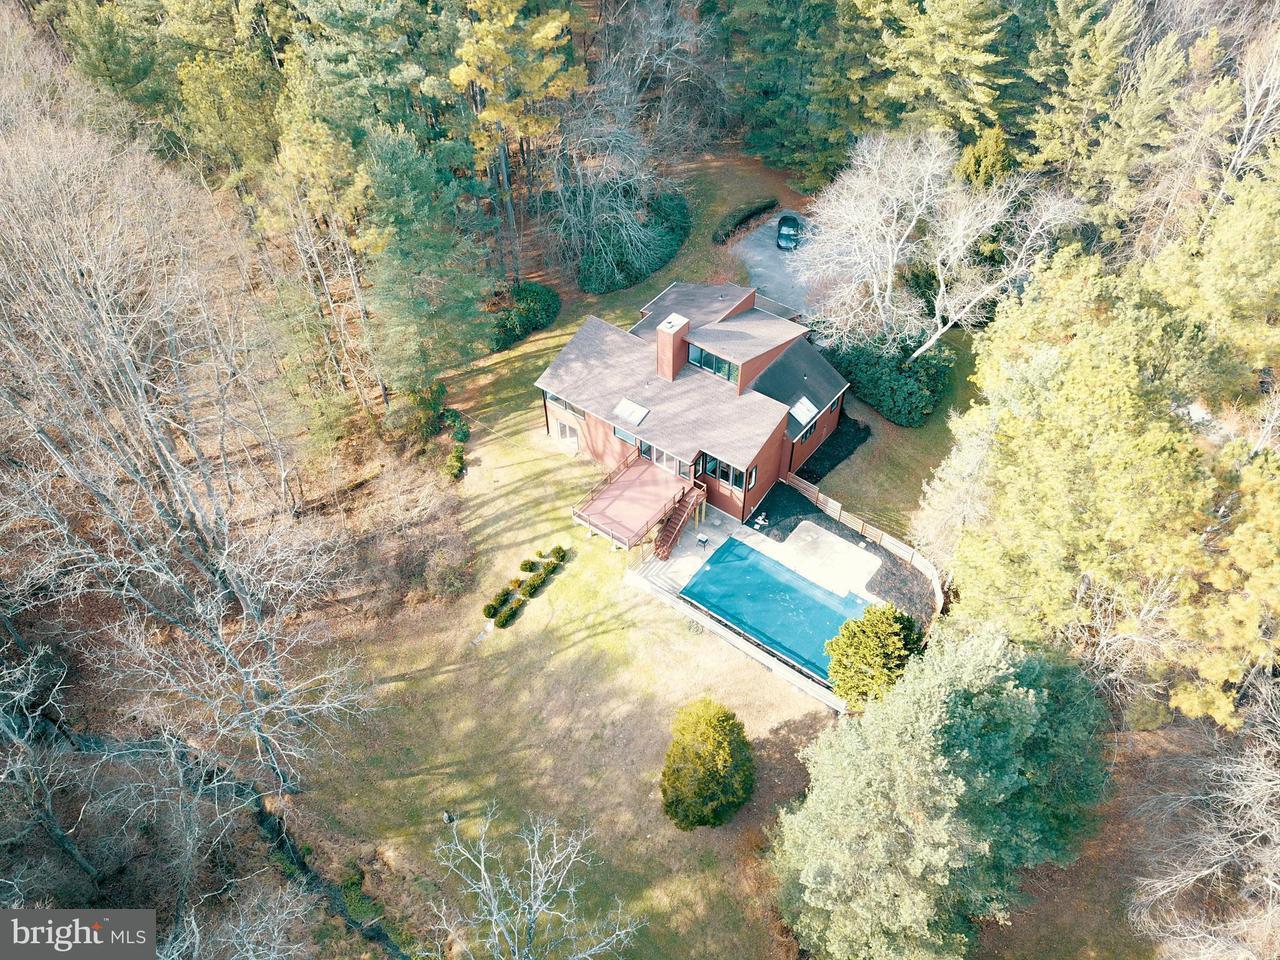 独户住宅 为 销售 在 16304 Falls Road 16304 Falls Road Upperco, 马里兰州 21155 美国